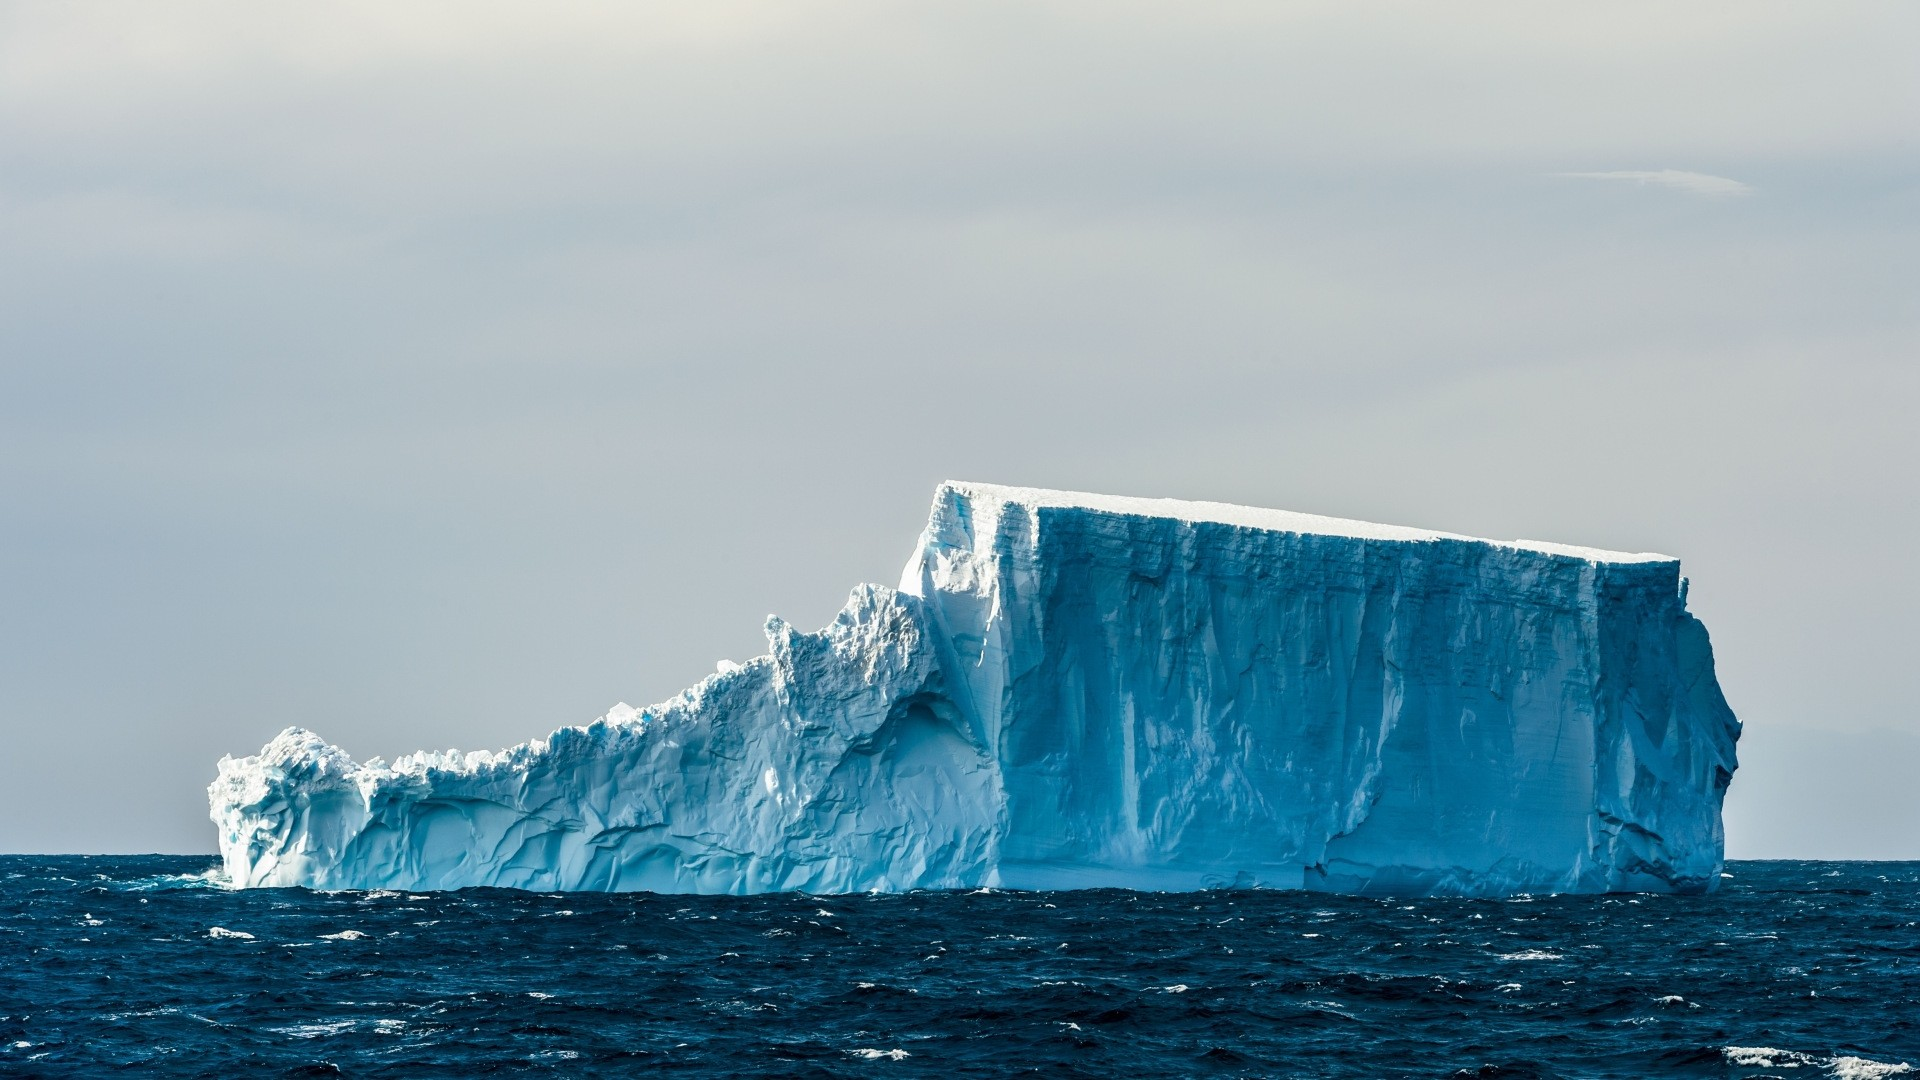 Iceberg hd desktop wallpaper